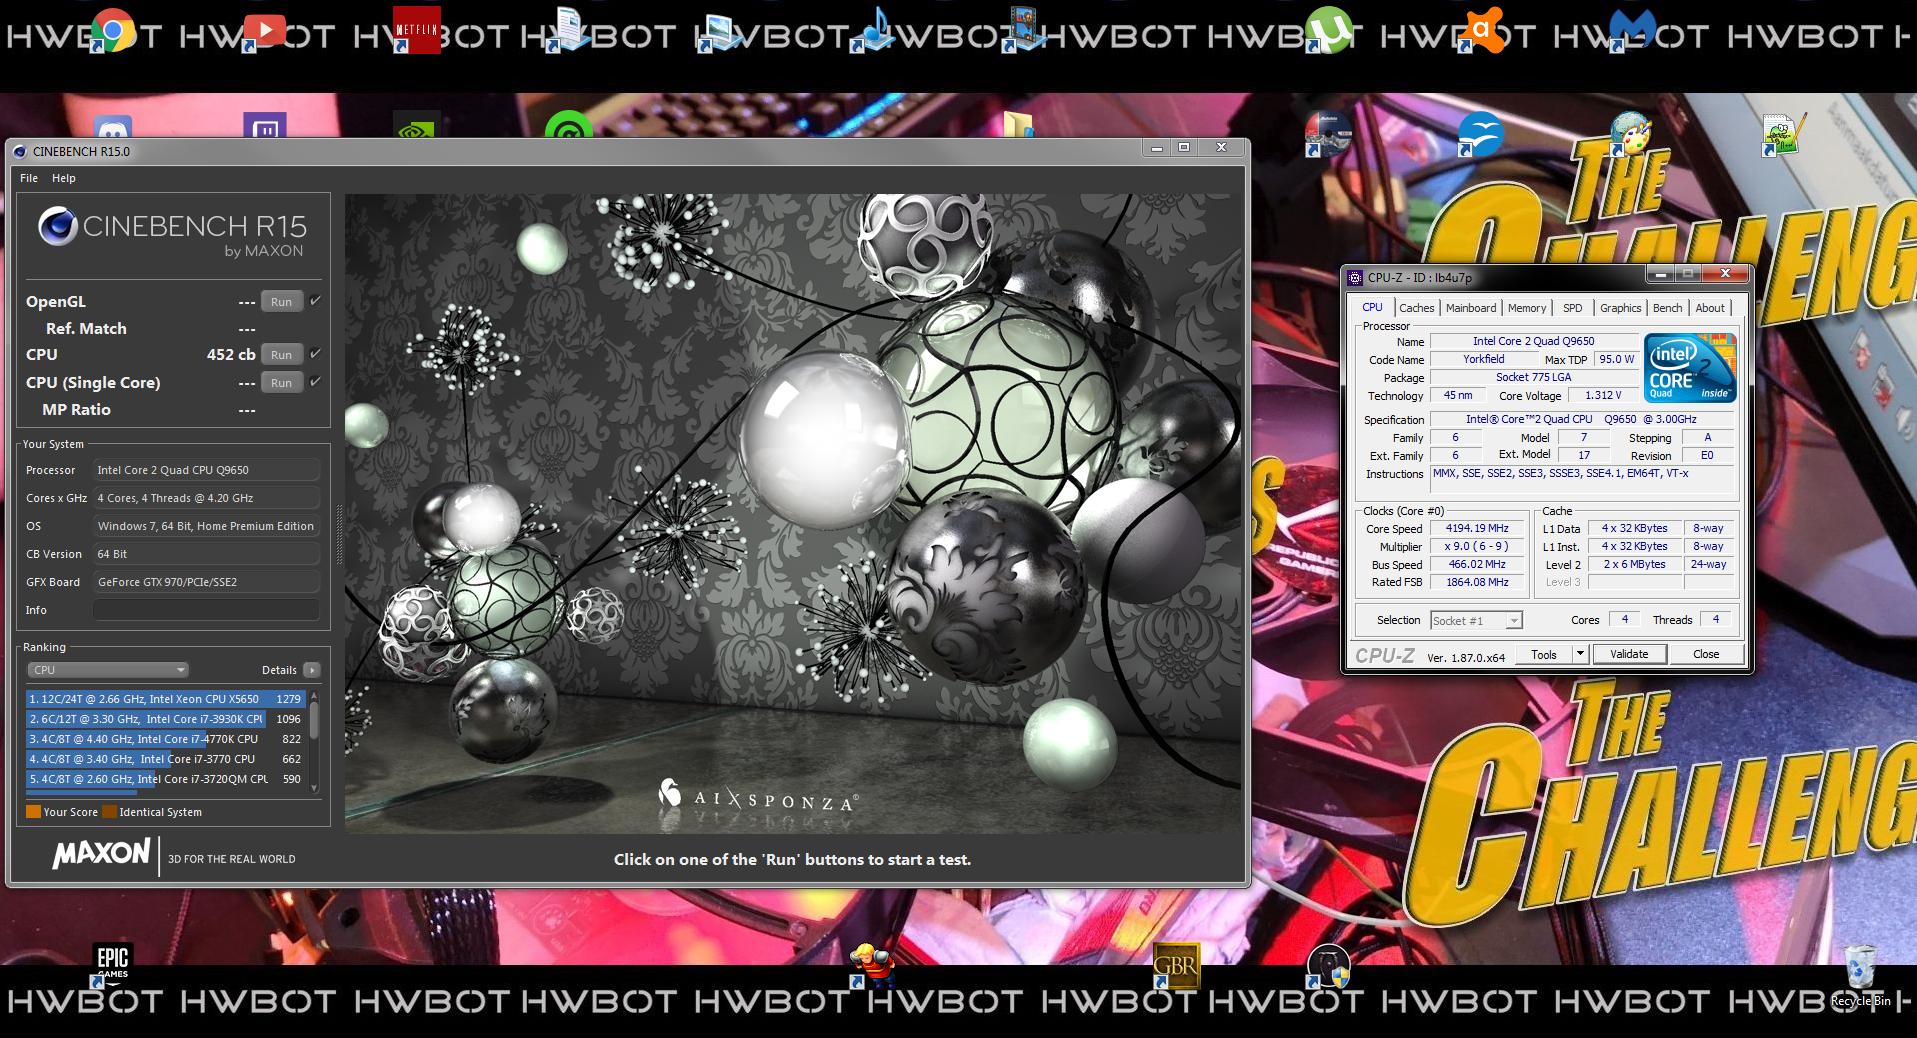 Enaversu`s Cinebench - R15 score: 452 cb with a Core 2 Quad